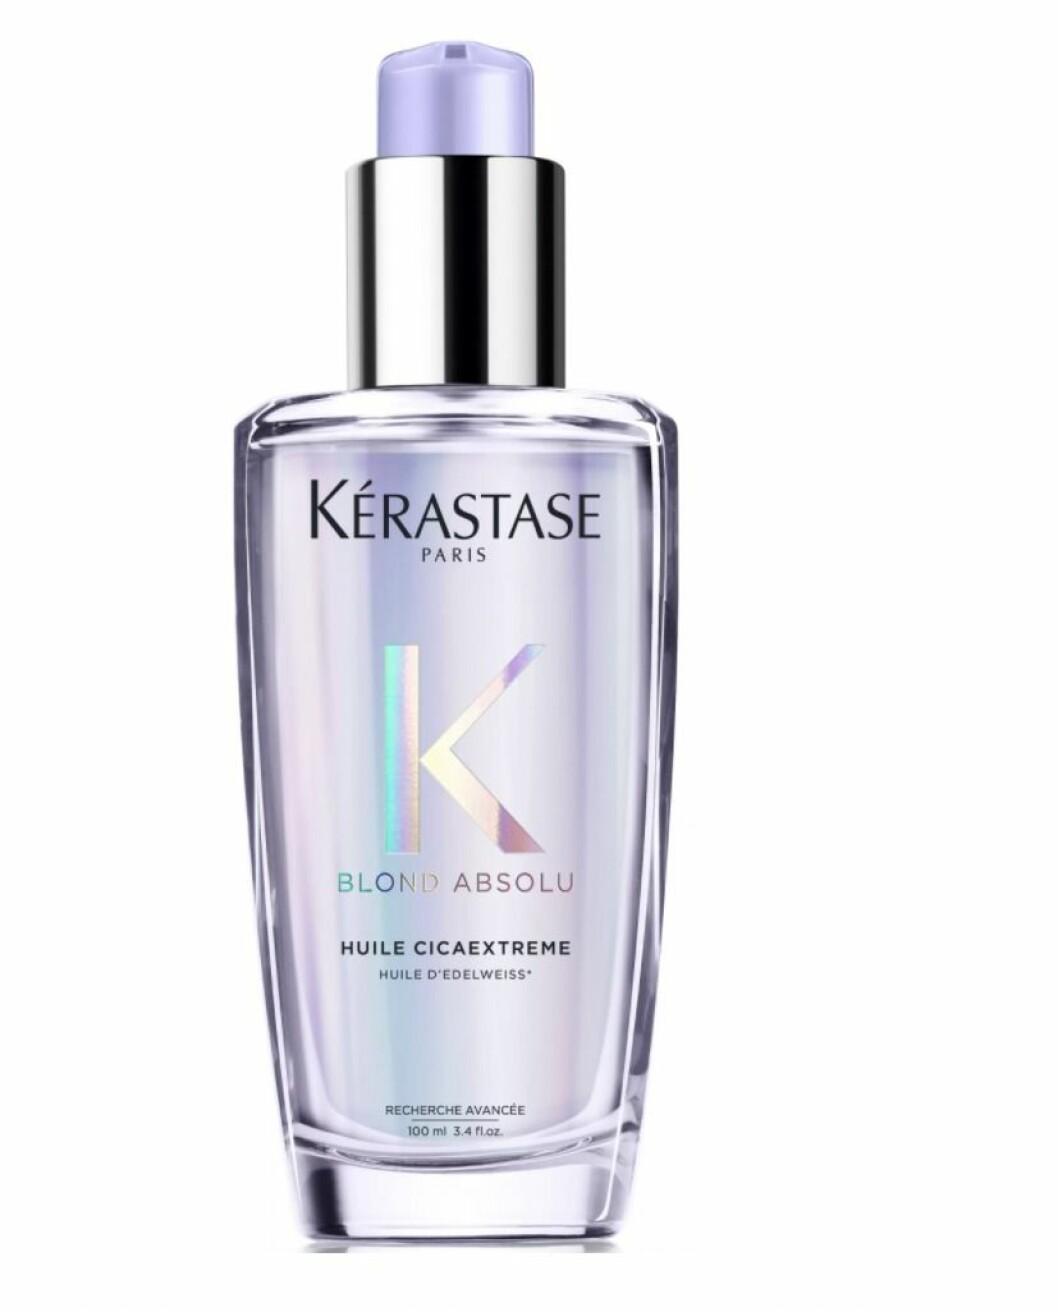 Blond absolu huile cicaextreme hair oil från Kerastase